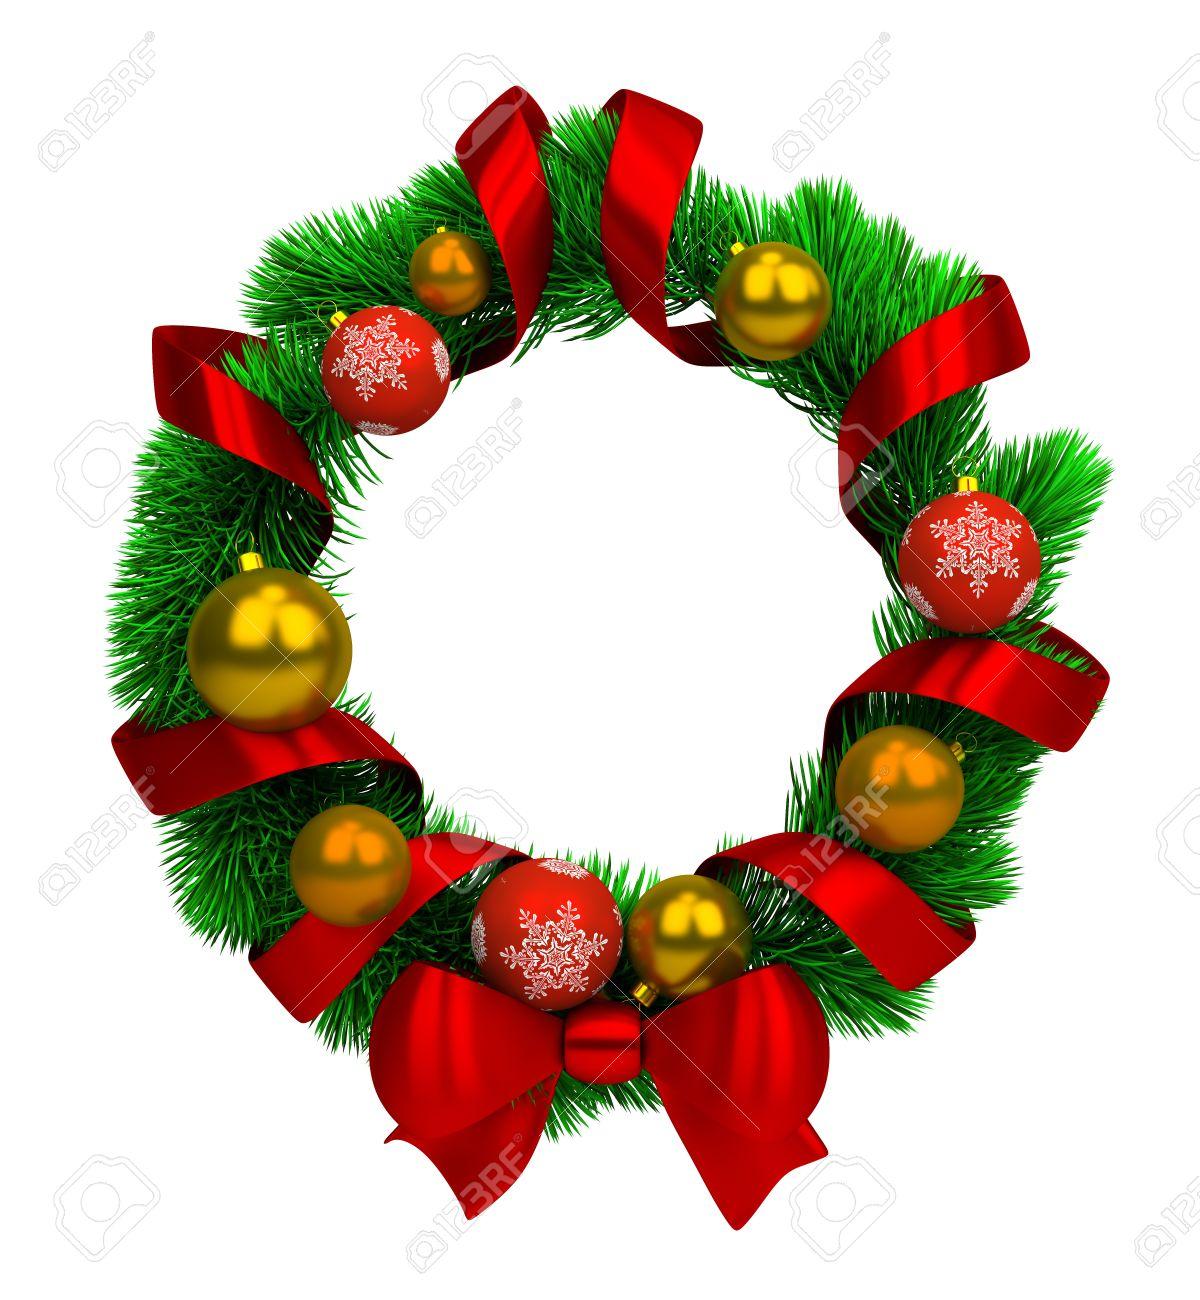 1200x1300 Free Christmas Wreath Border Clip Art